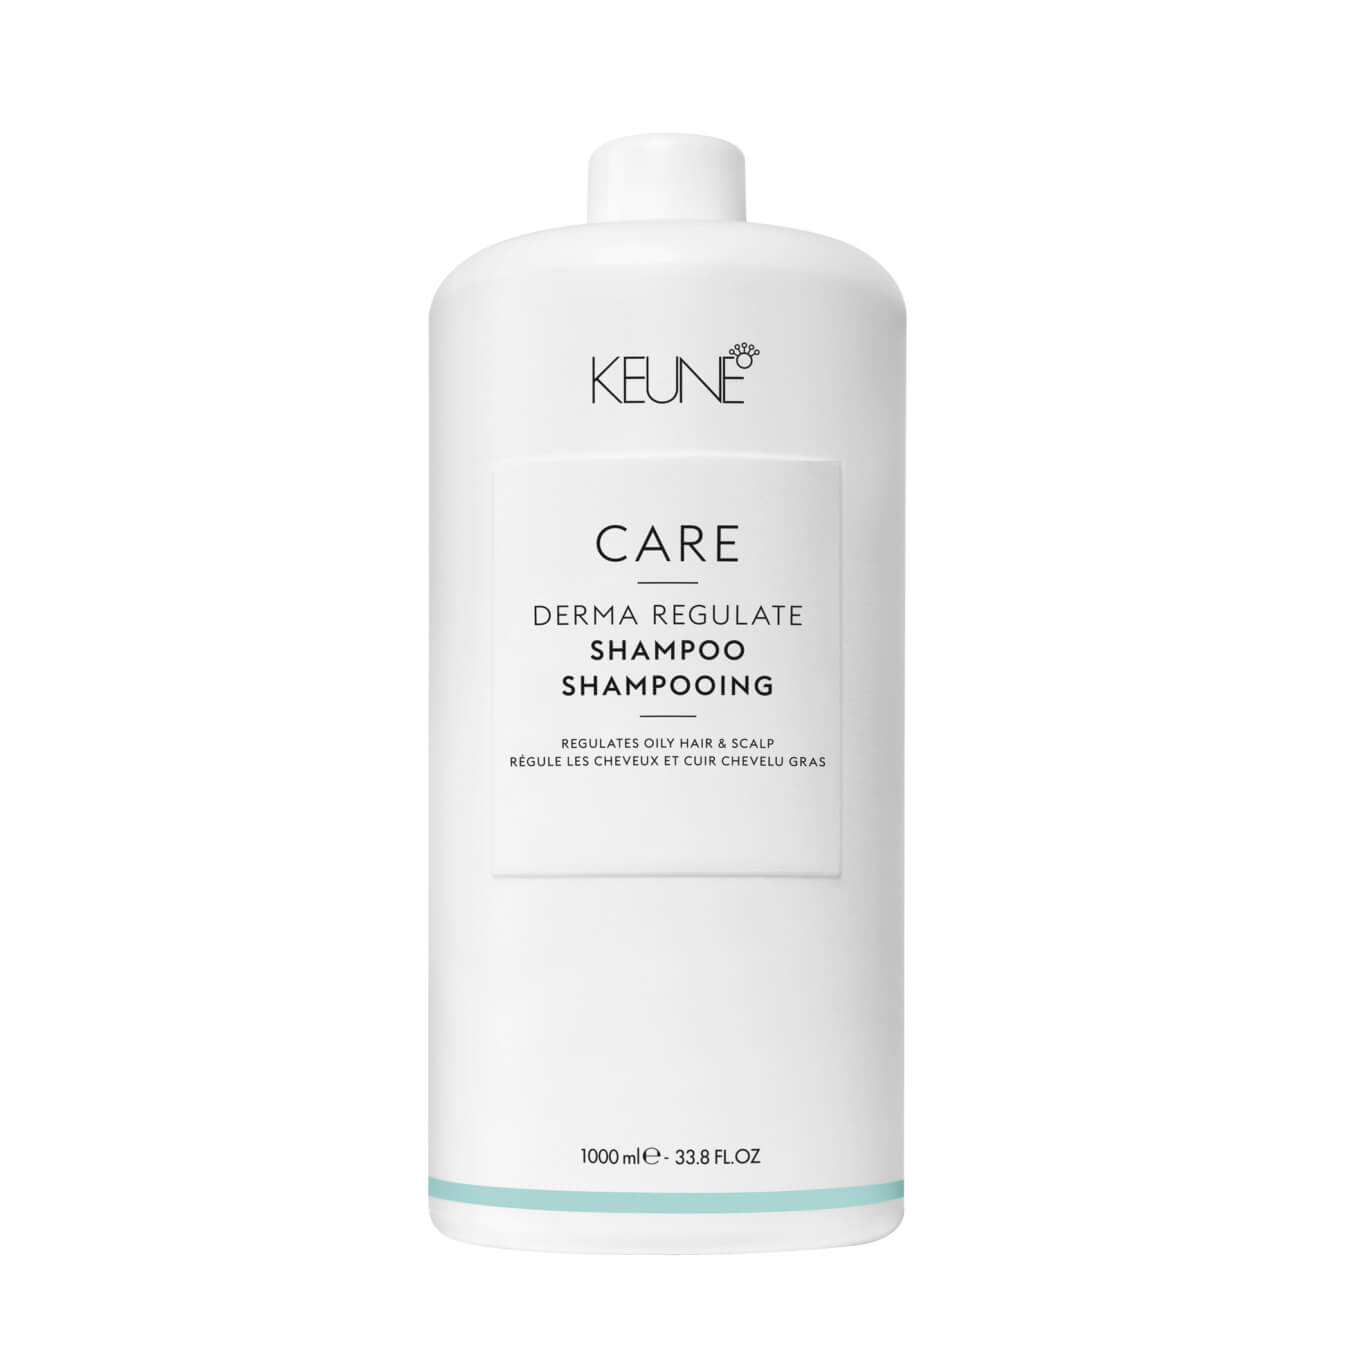 Kauf Keune Care Derma Regulate Shampoo 1000ml